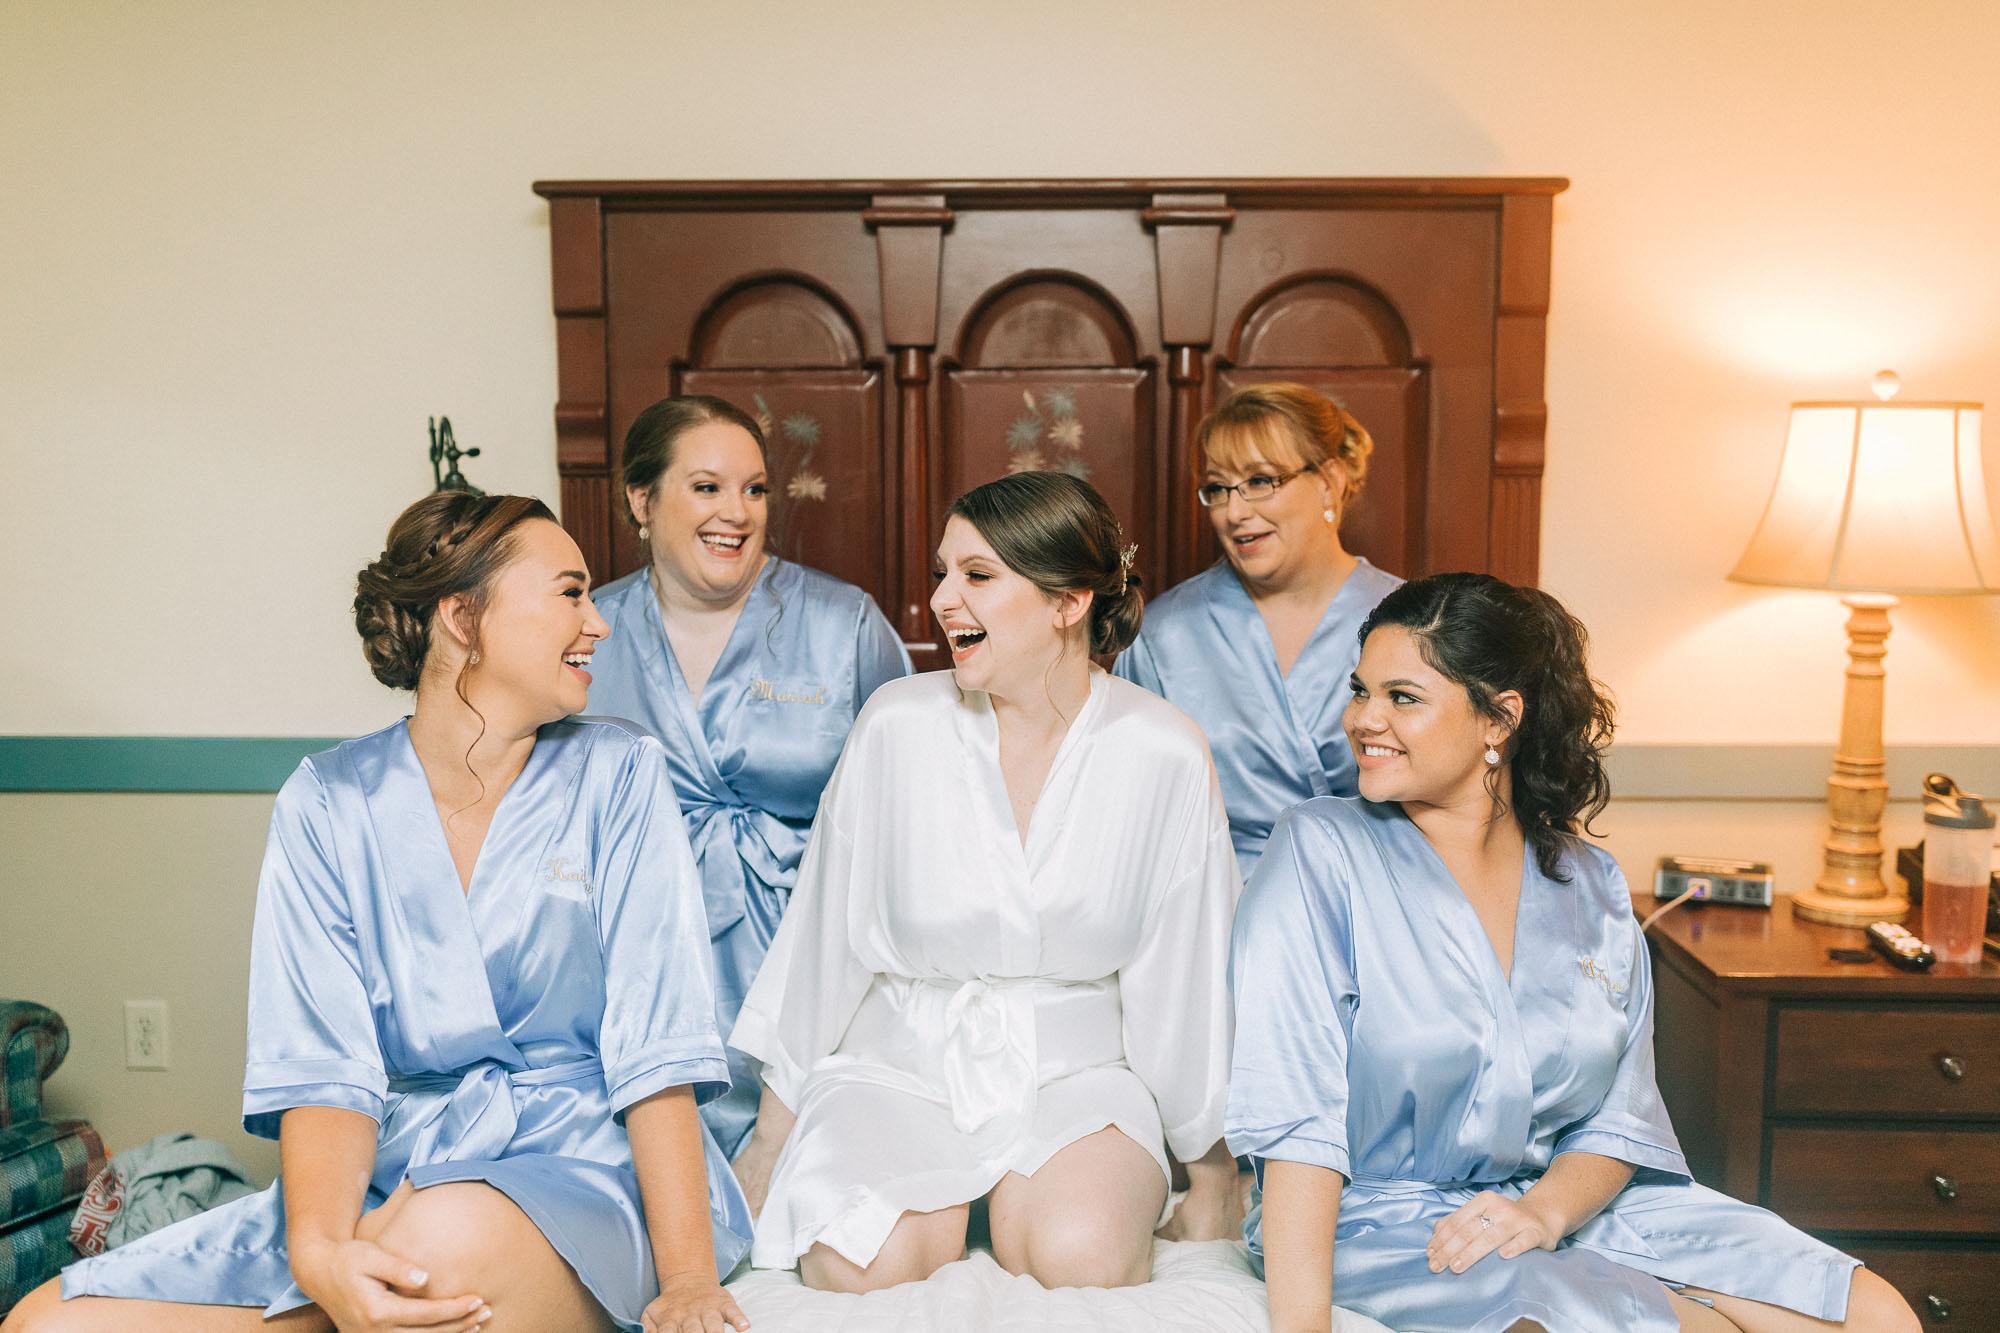 rolling-pines-berwick-pa-wedding-6610.jpg